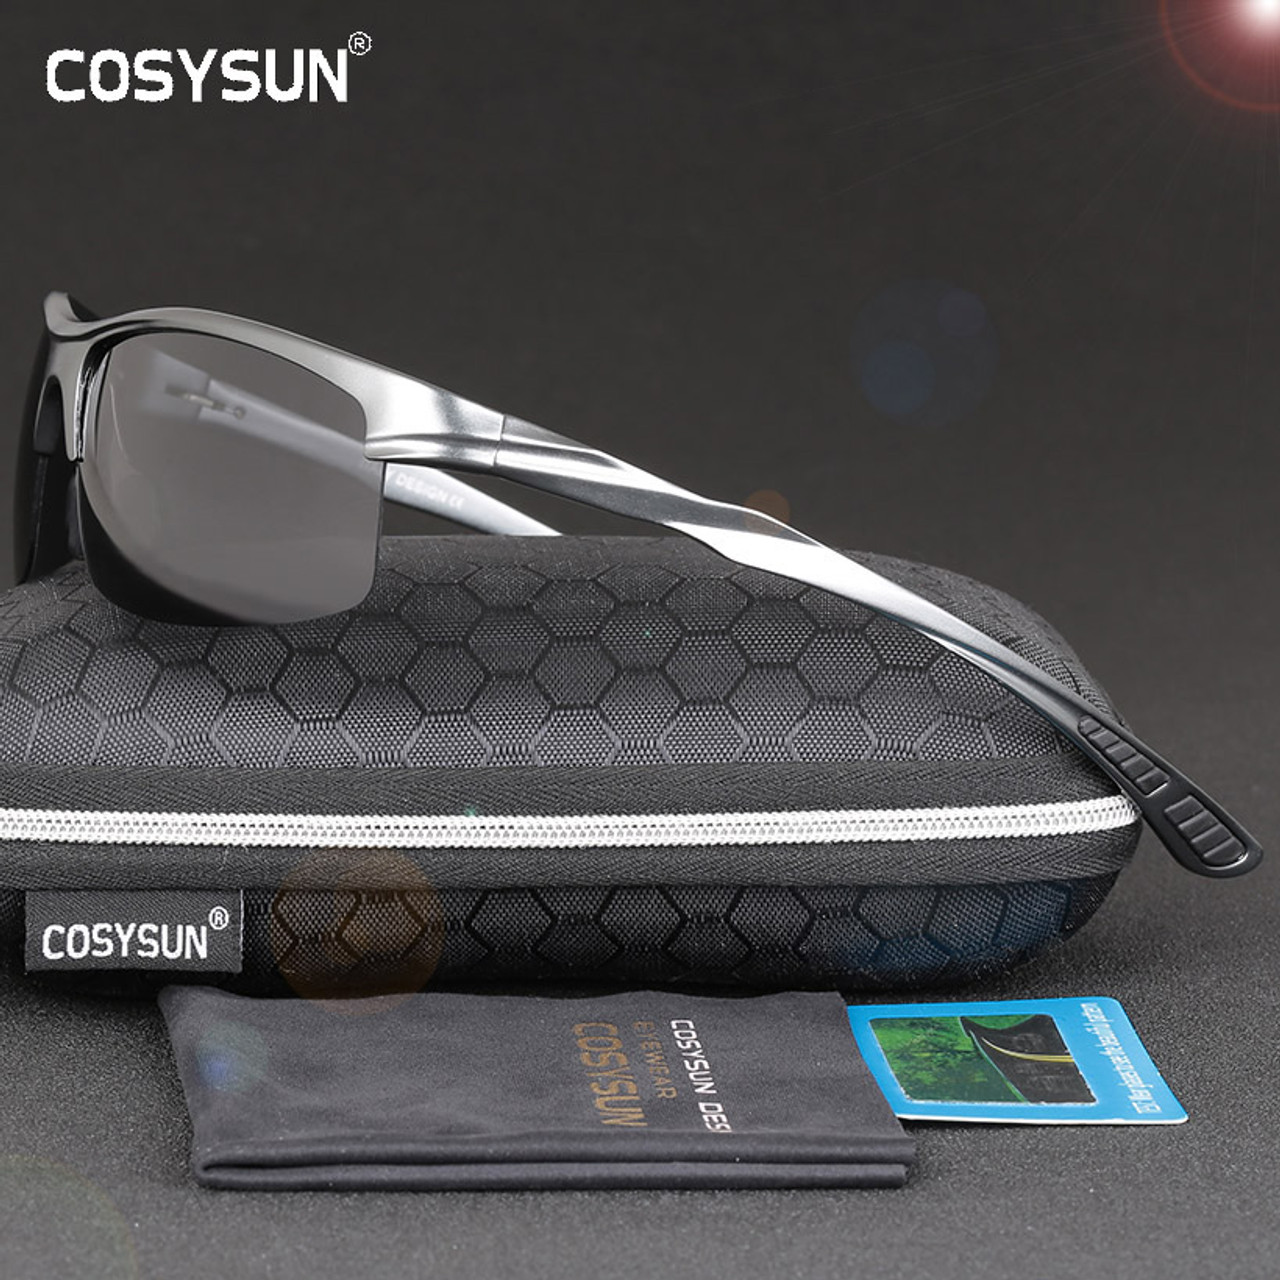 e187f5b0e58 COSYSUN Brand Aluminum Polarized Sunglasses Men Sports Sun Glasses Driving  Glasses Mirror Goggle Eyewear oculos de sol CS0213 - OnshopDeals.Com